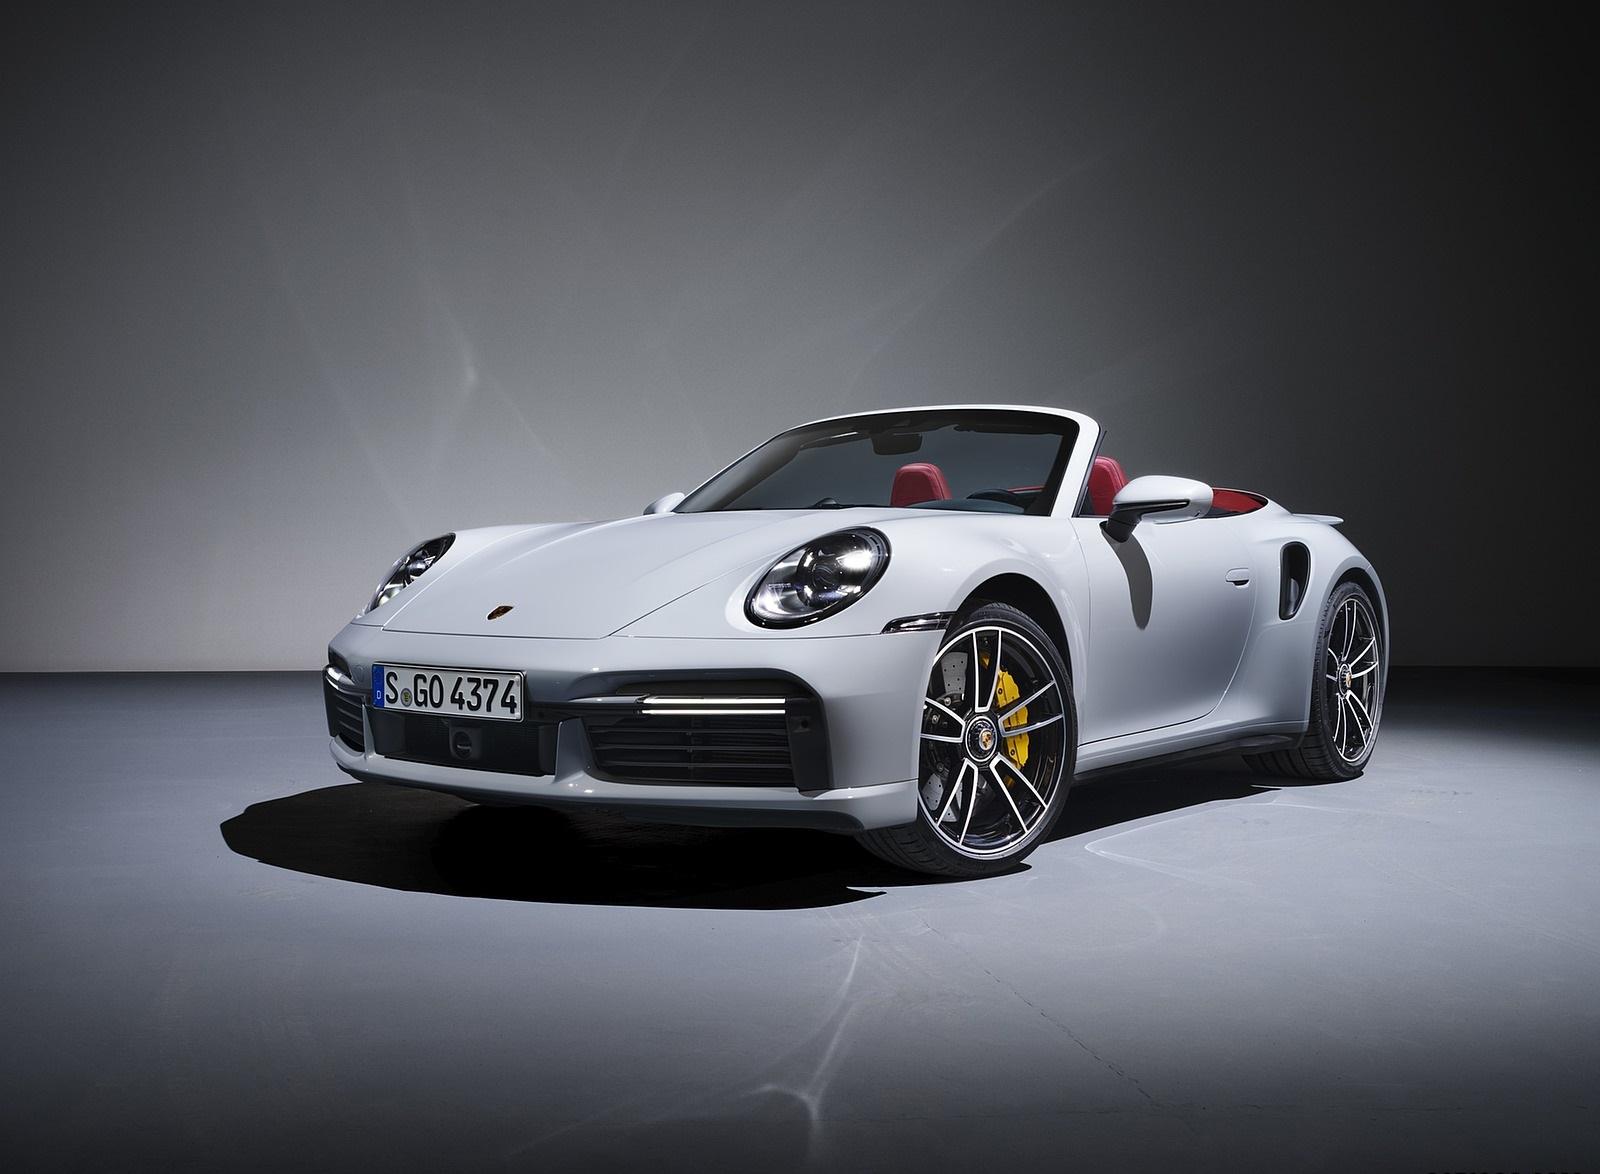 2021 Porsche 911 Turbo S Cabriolet Front Three-Quarter Wallpapers (1)